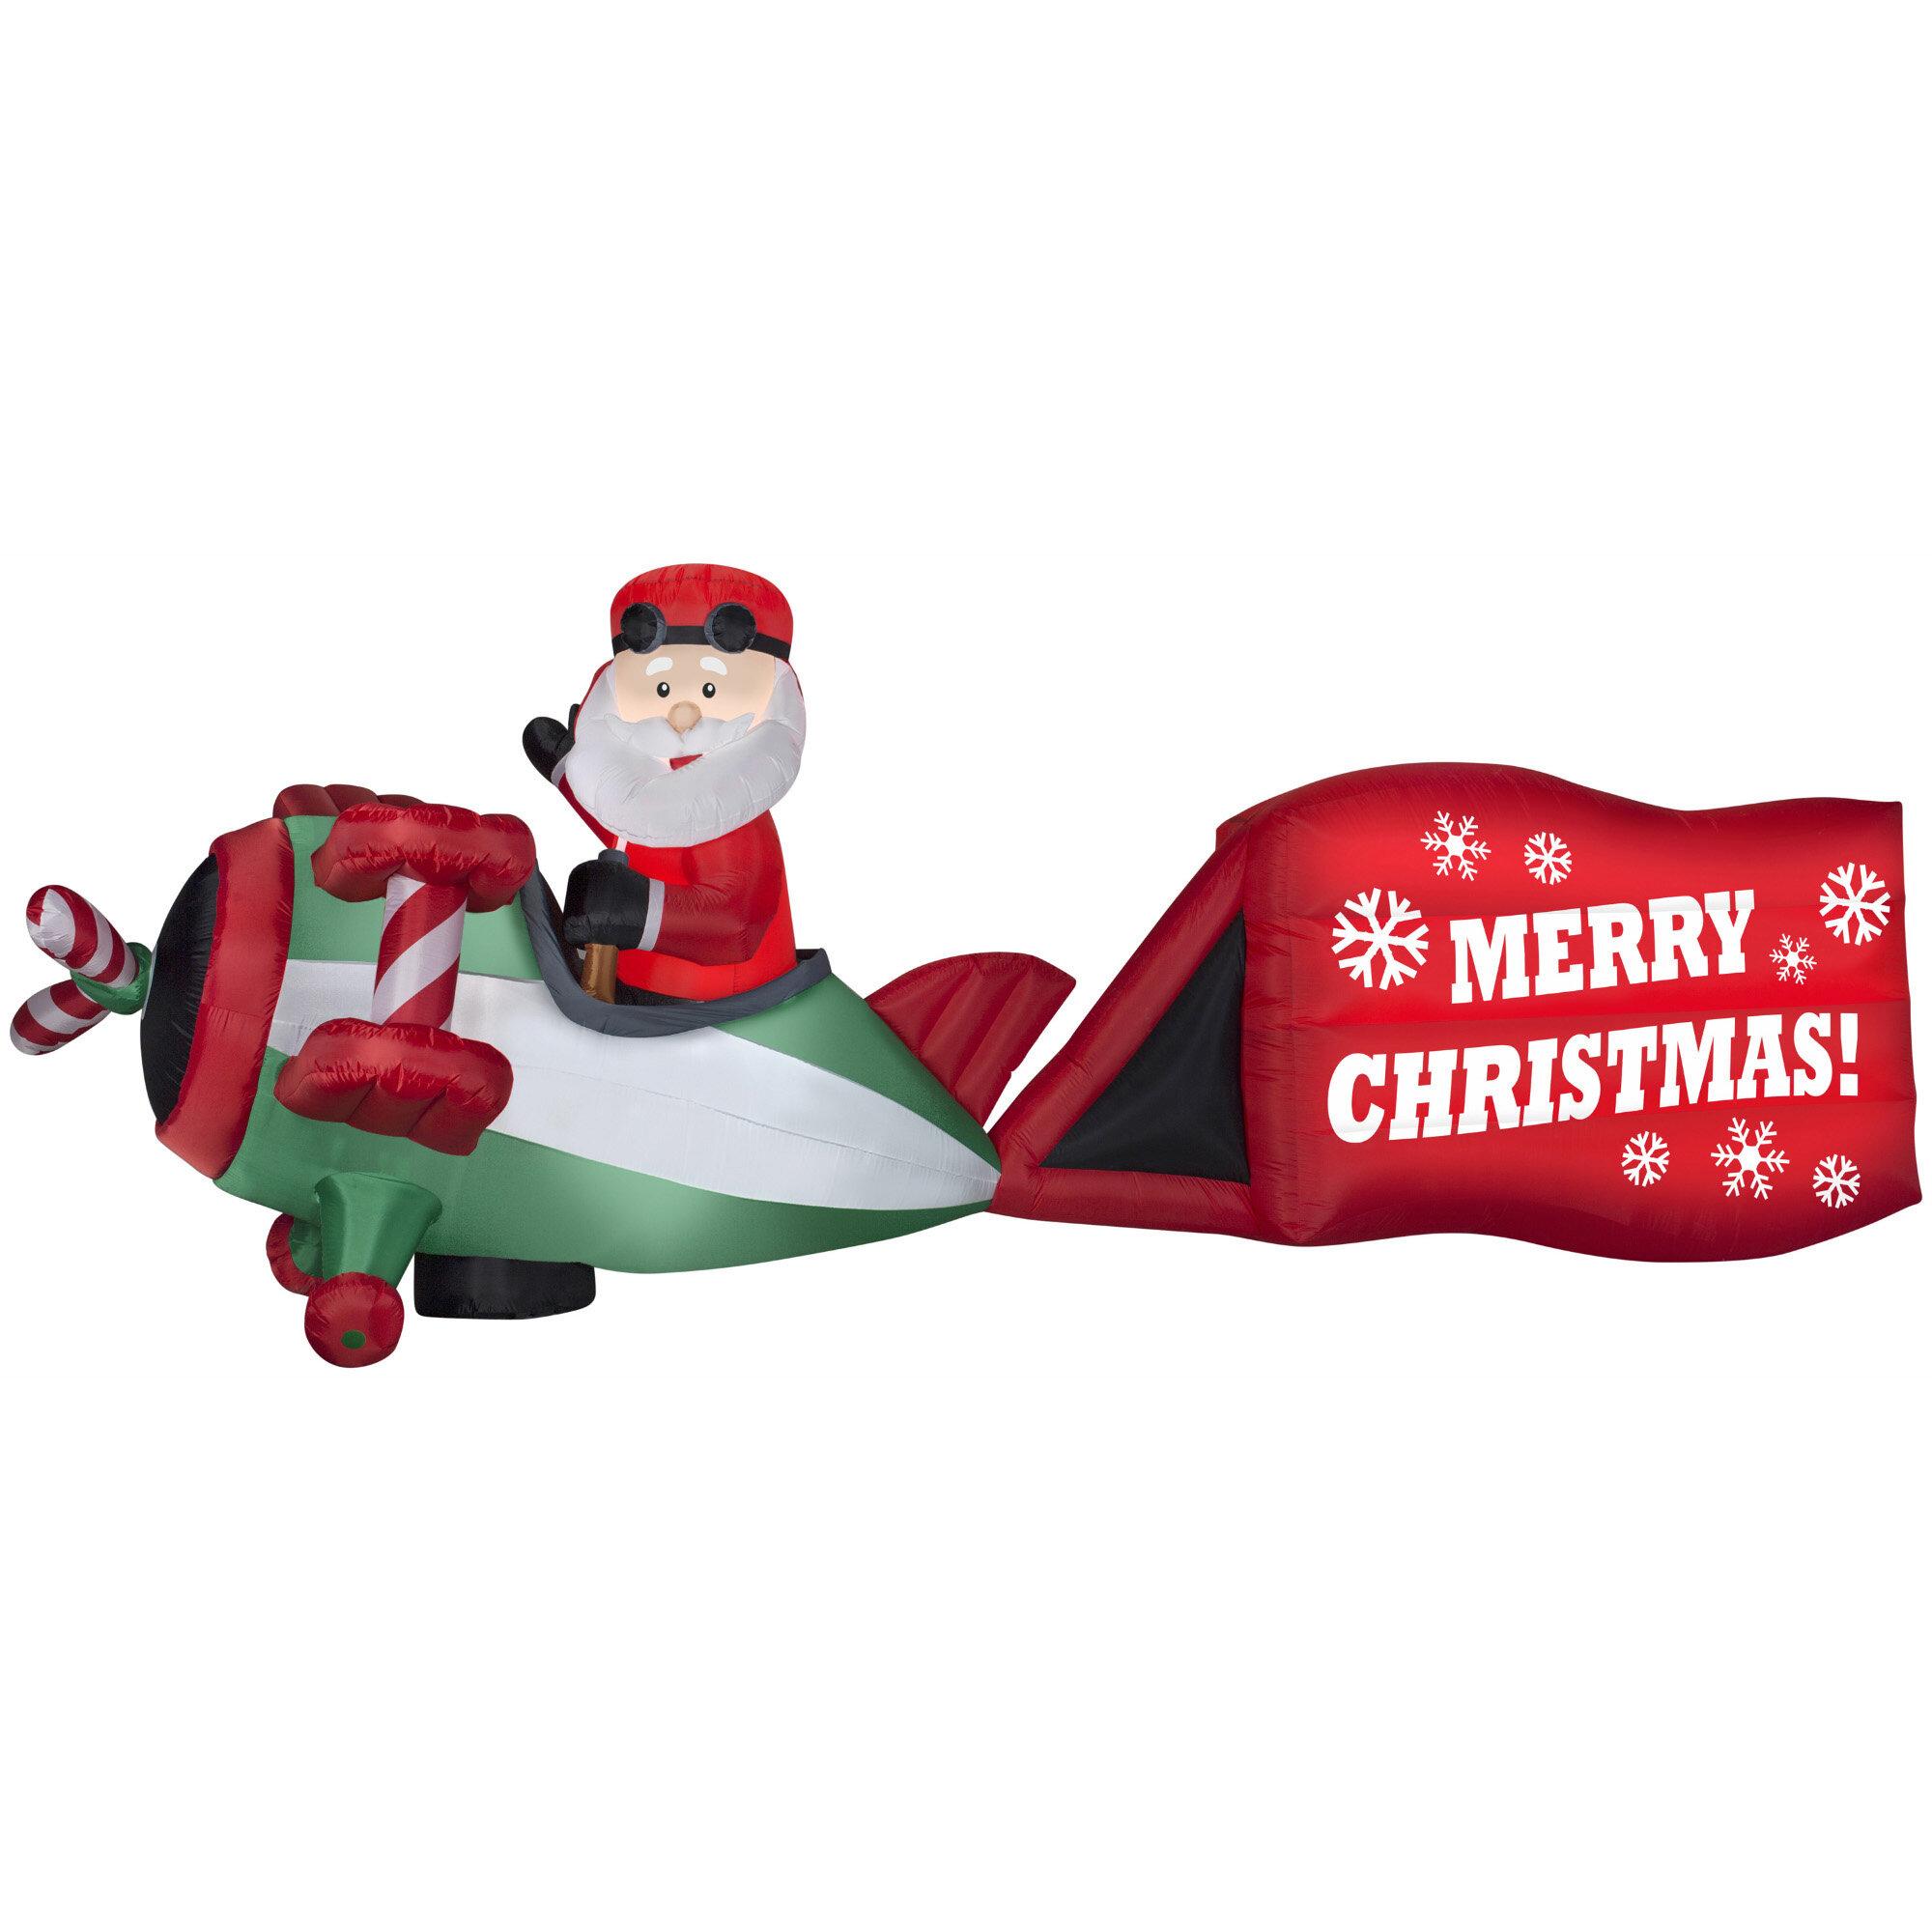 Christmas Inflatable.Santa On Airplane With Sign Merry Christmas Inflatable